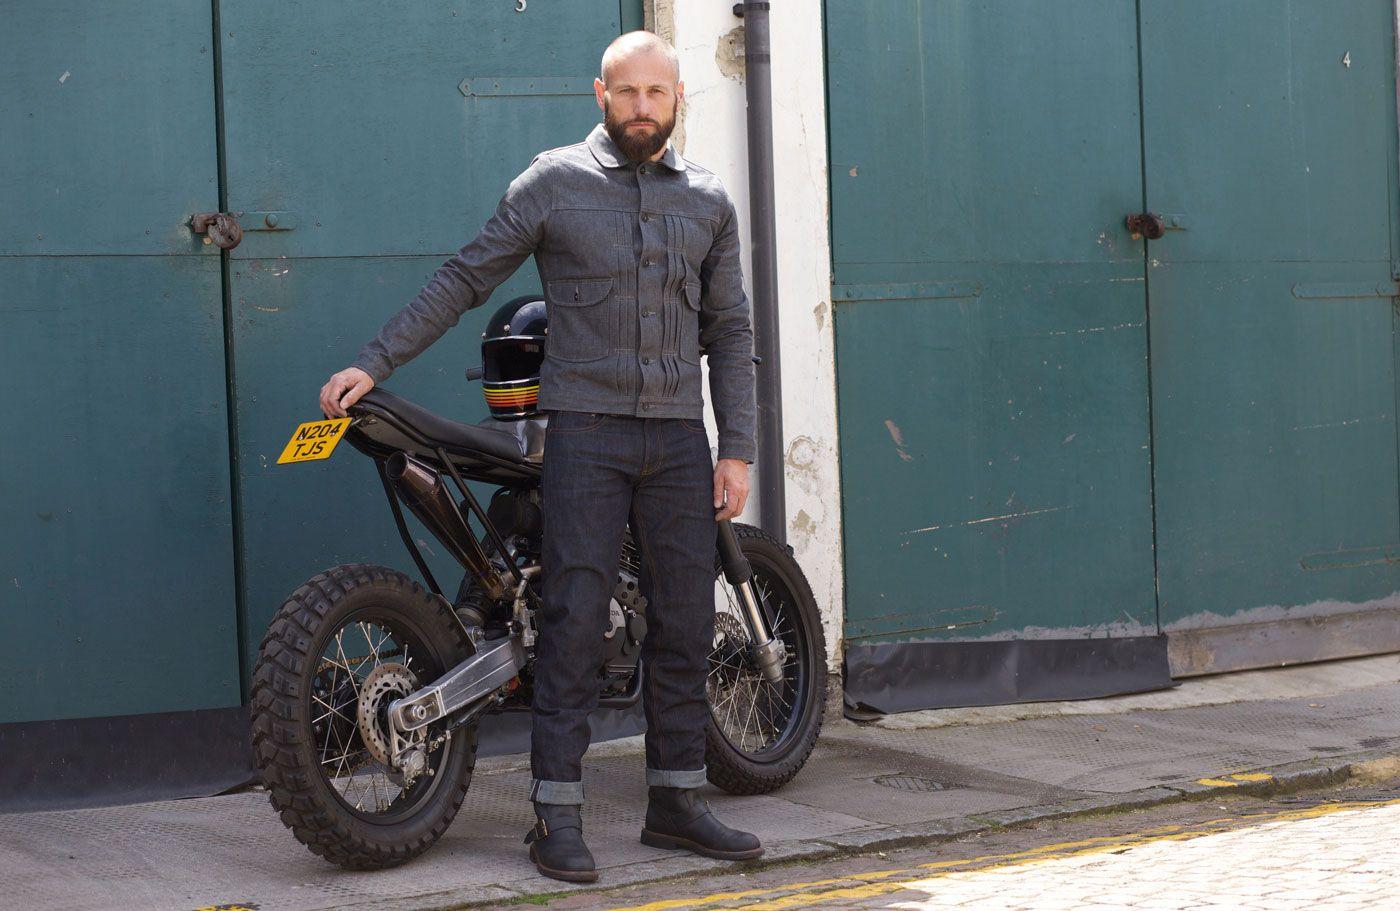 resurgence-gear-cafe-racer-protective-jeans-2 | resurgence gear